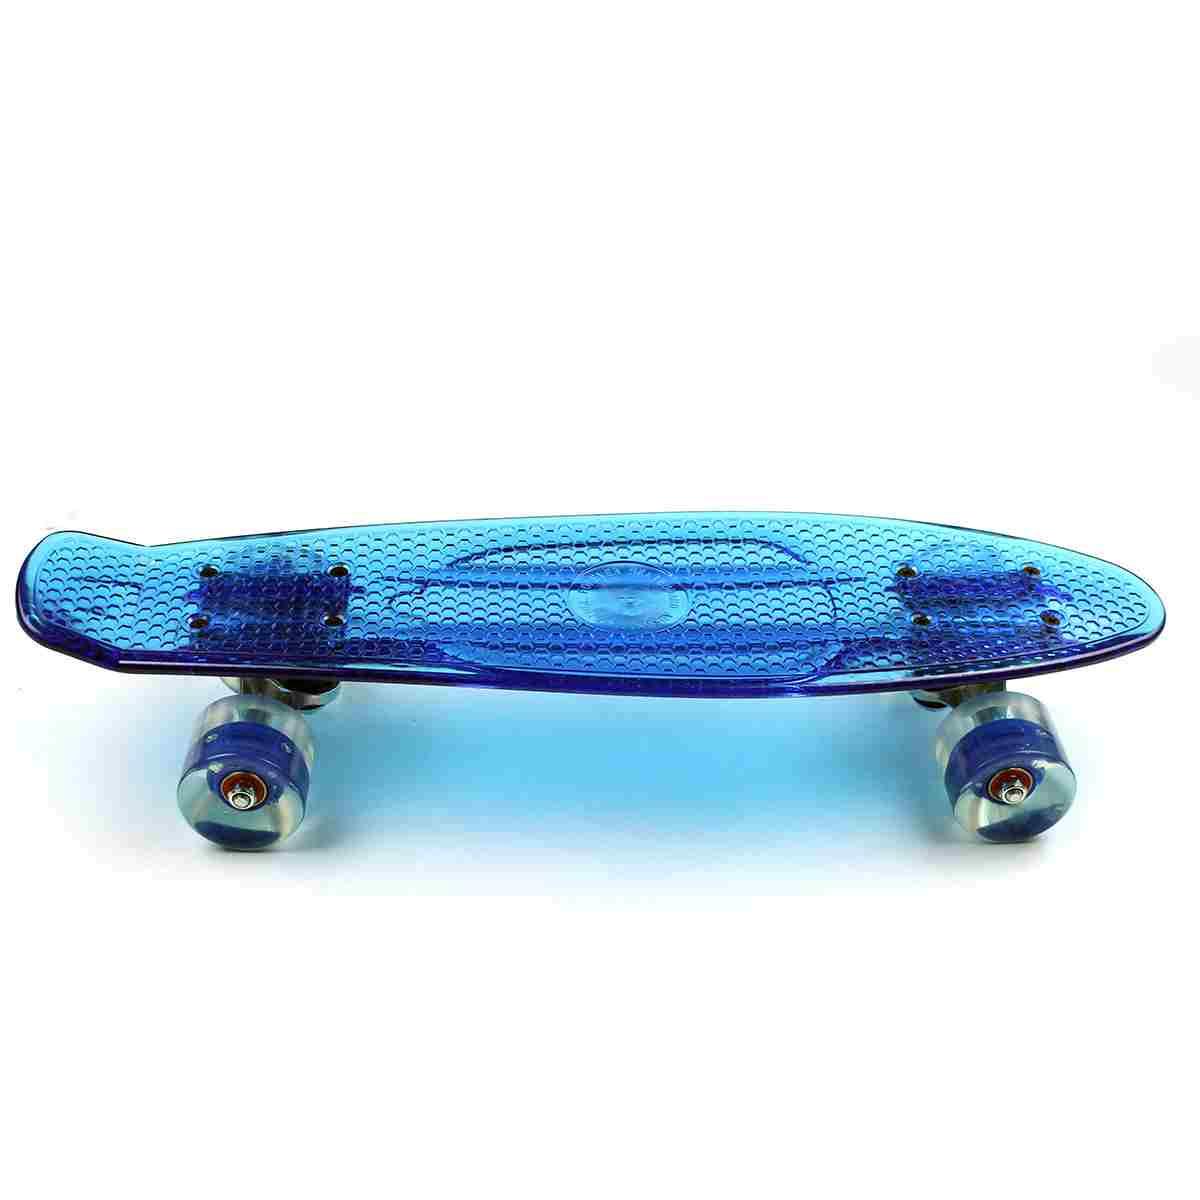 Eprocool Plastic Skateboard Transparent Blue Board PU Wheels Cruiser Flying Fish Skateboard